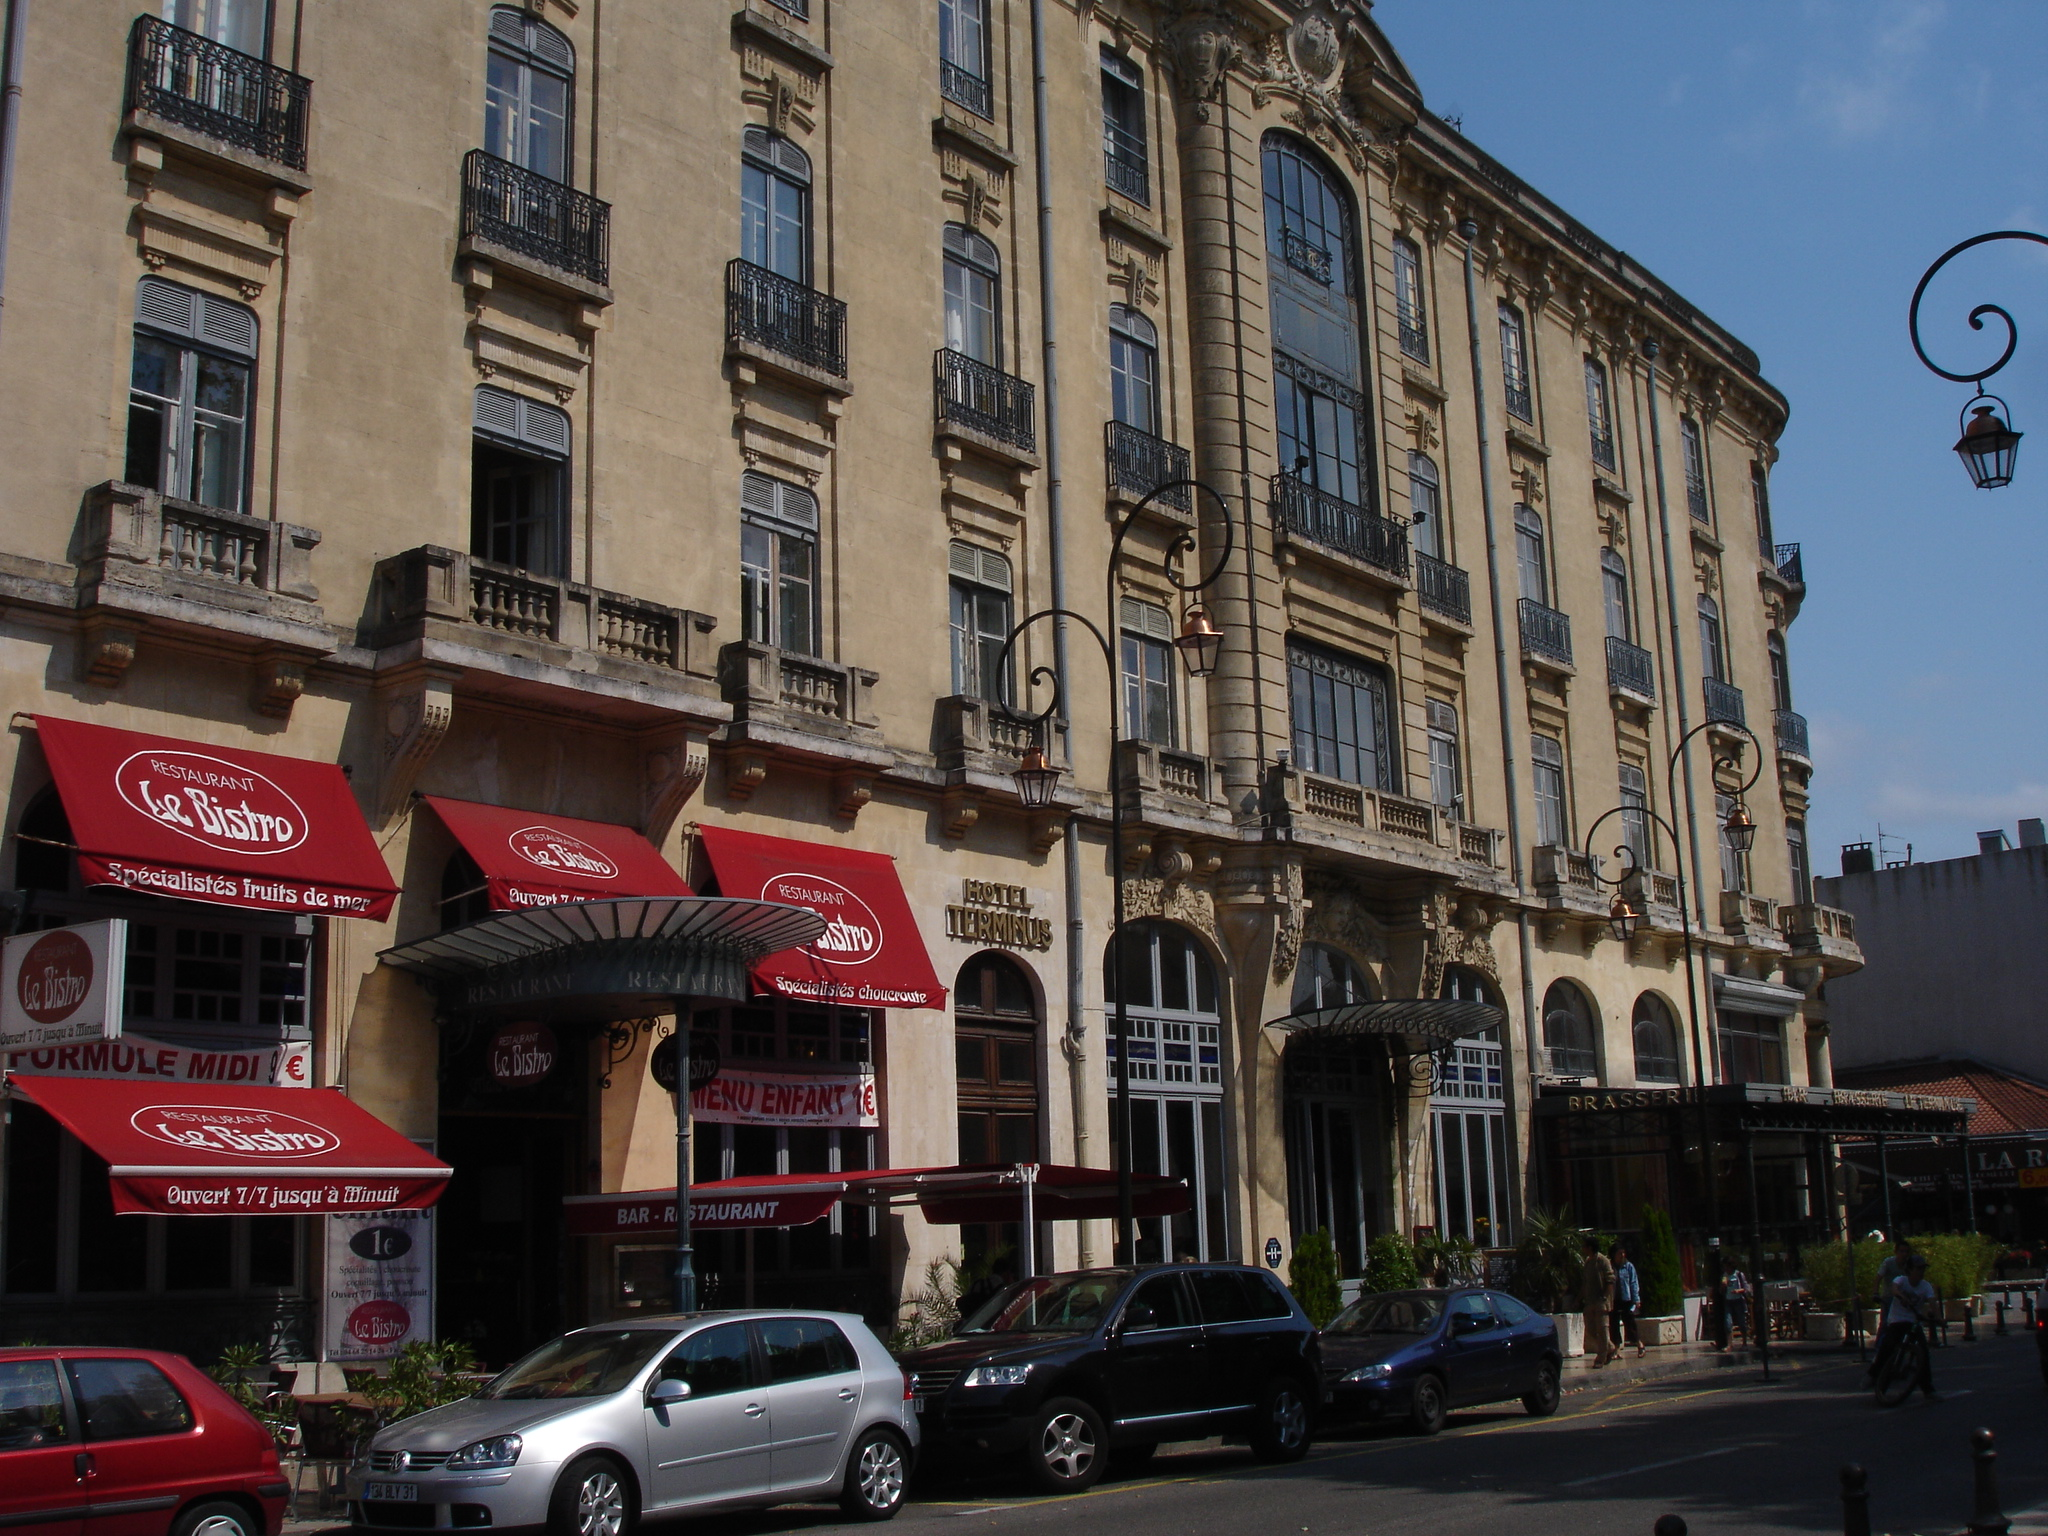 terminus hotels Contact 25hours hotel paris terminus nord 12 boulevard de denain 75010 paris general contact: p +33 1 42 80 20 00 terminusnord@25hours-hotelscom ×.